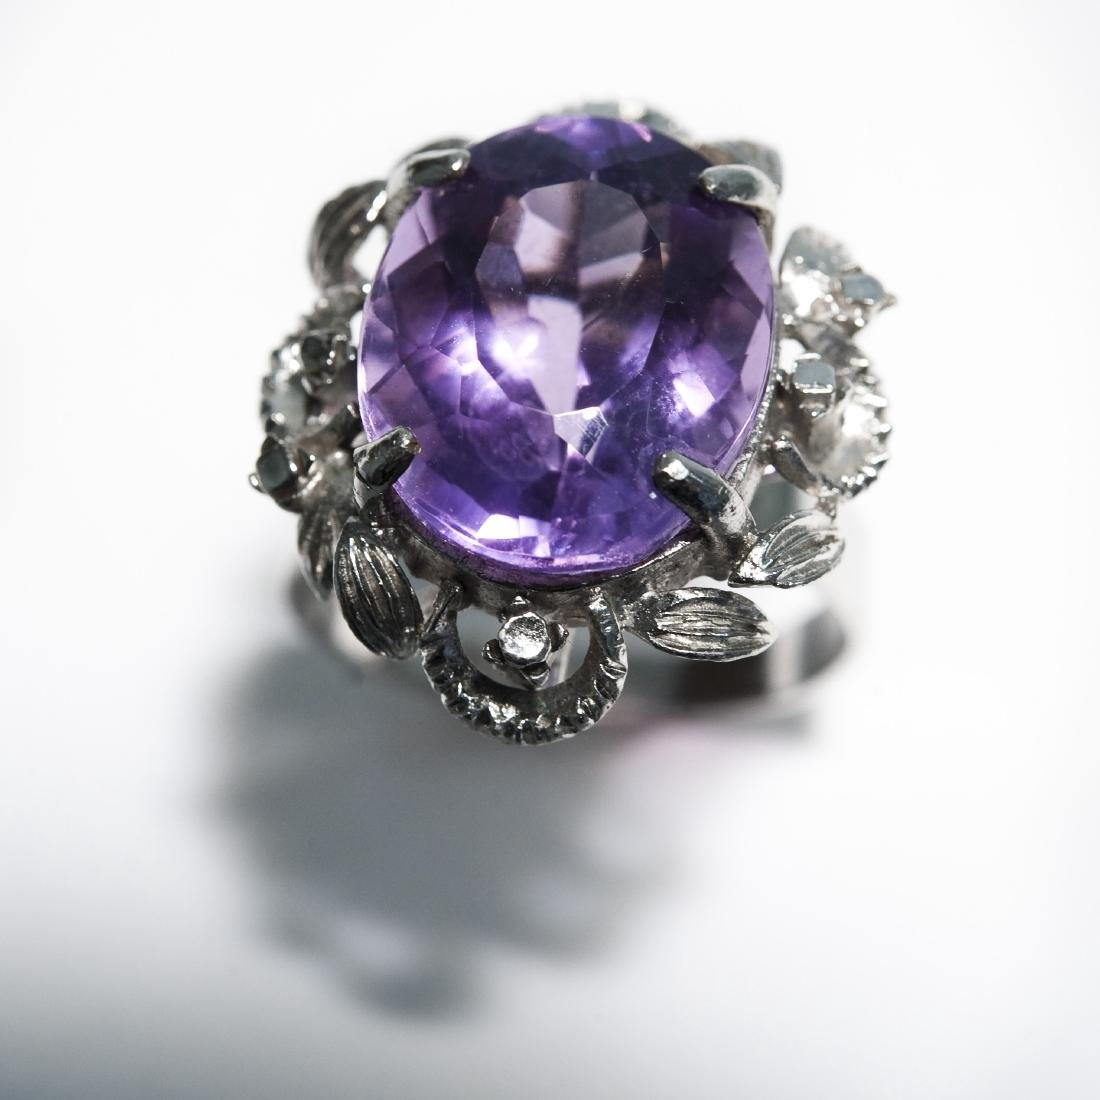 14K White Gold & Amethyst Ring. - 2